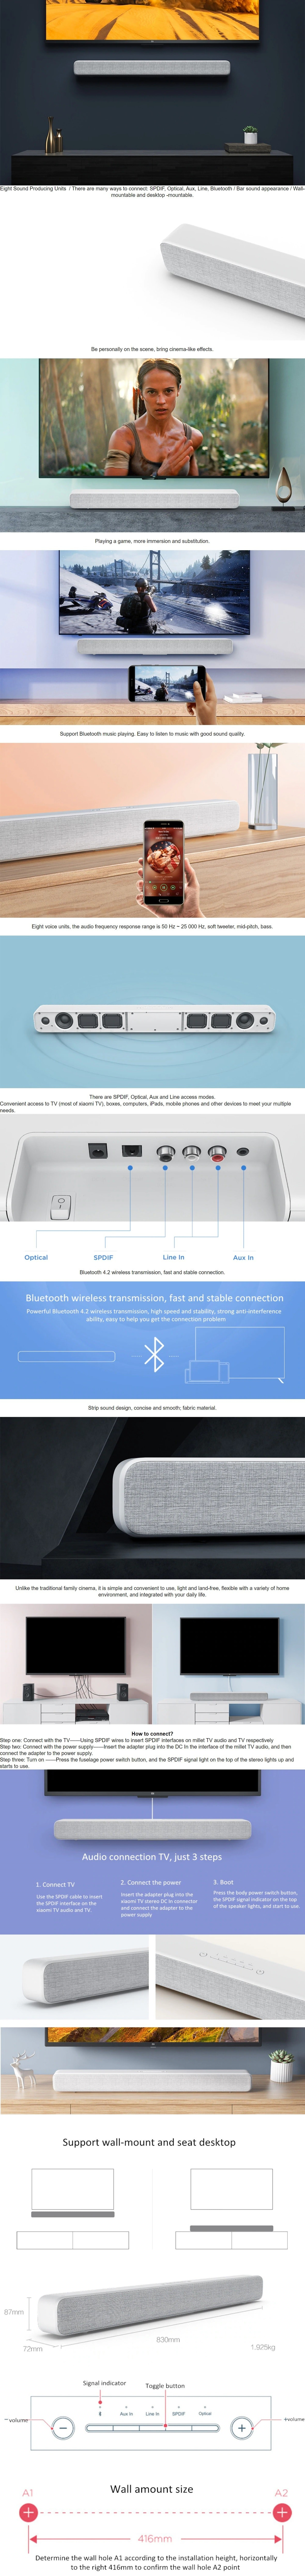 Prezentare-Xiaomi-Soundbare43776c68192fe22.jpg